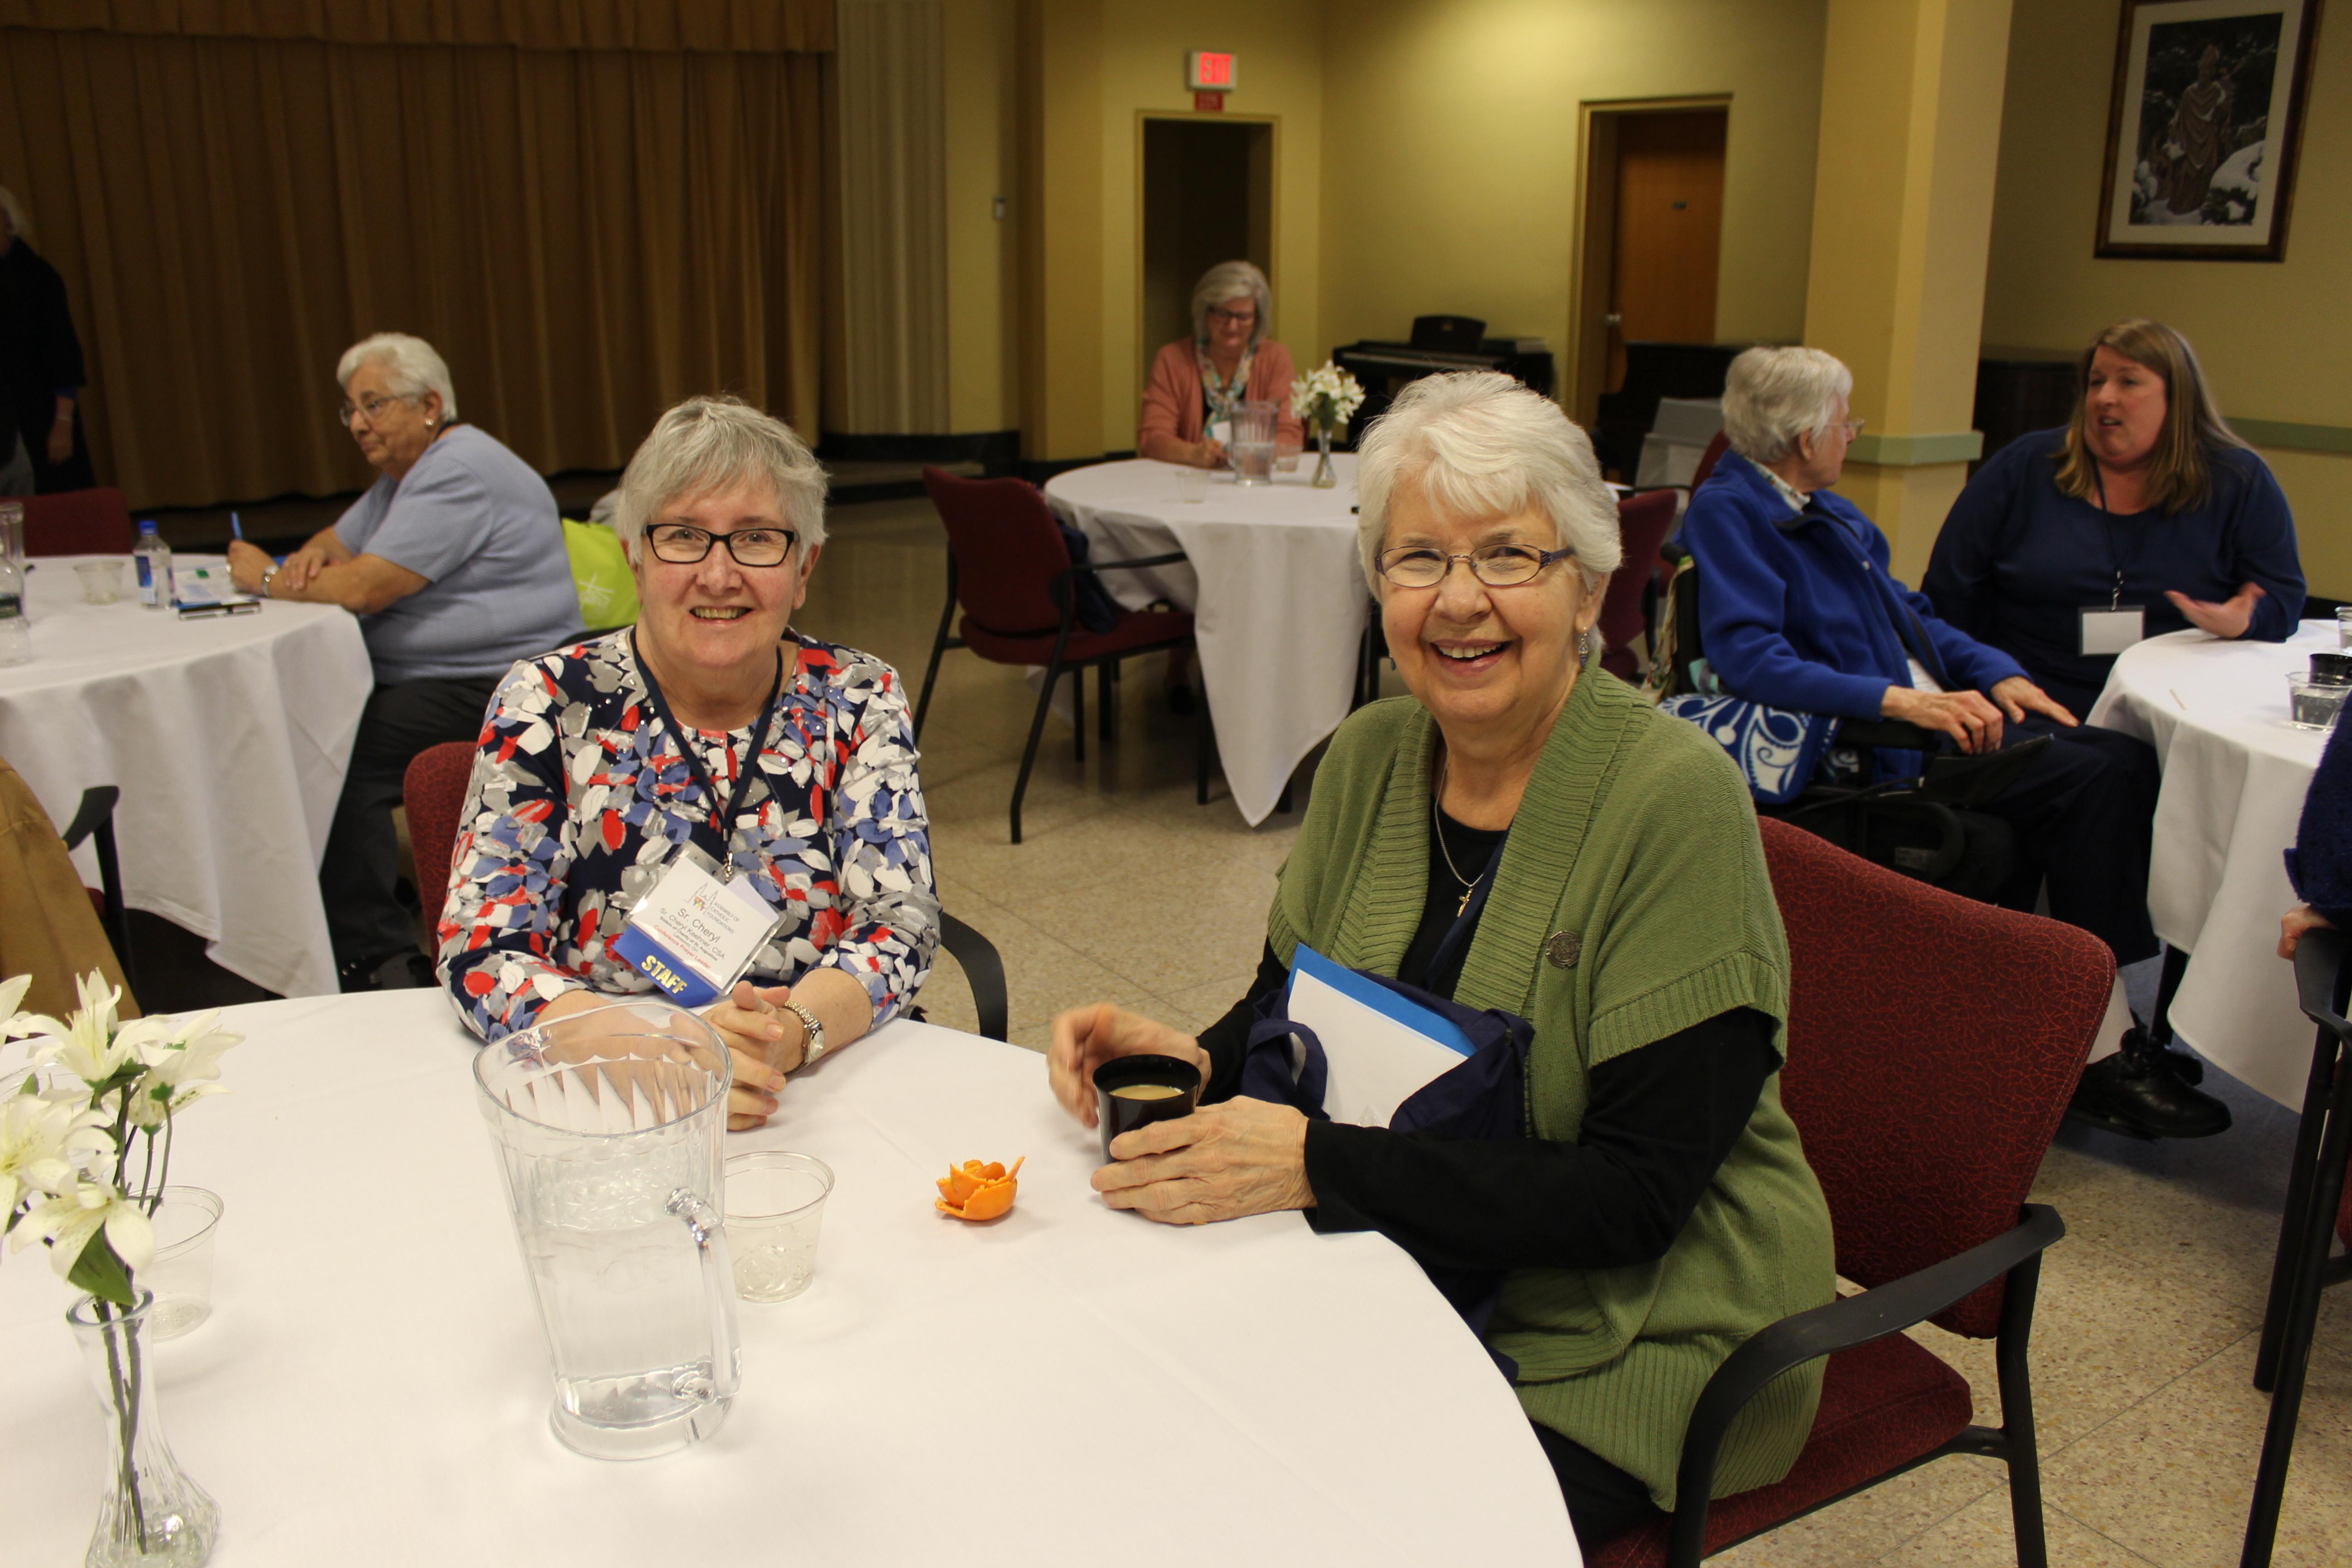 Sister Cheryl Keehner, CSA and Sister Marian Durkin, CSA